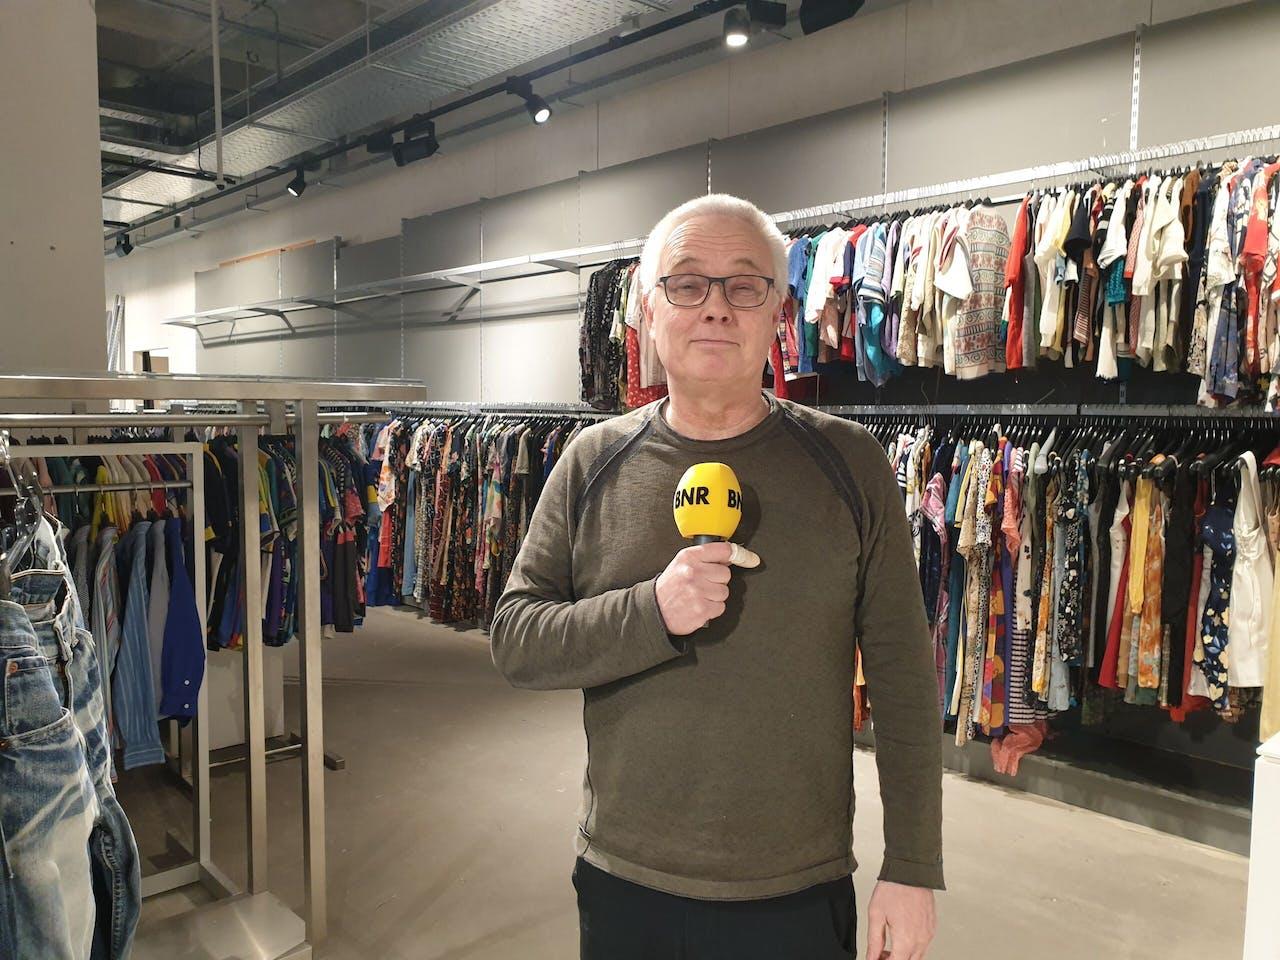 Ondernemer Peter van der Hooft tussen de vintage kleding